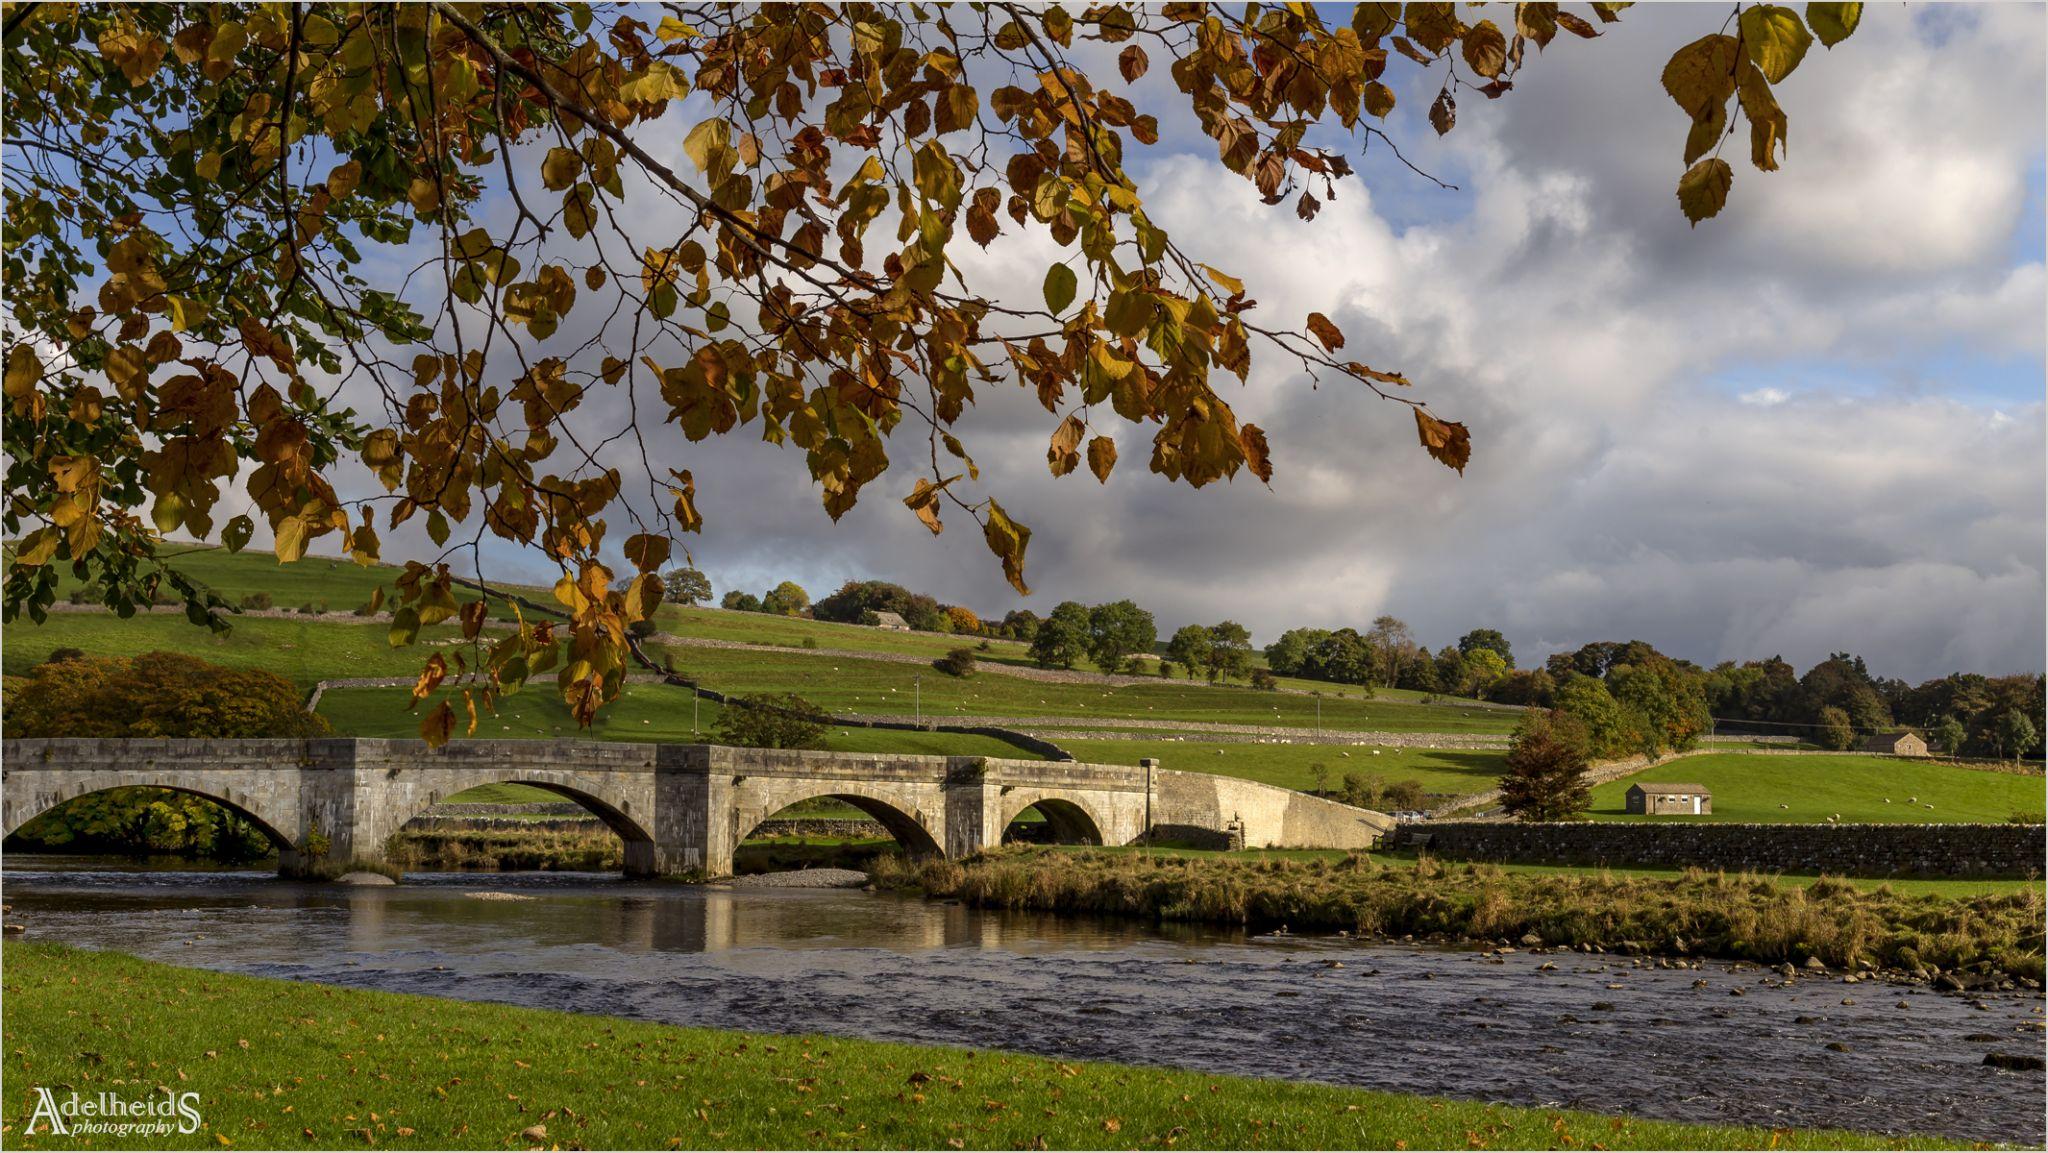 Burnsall Bridge, United Kingdom